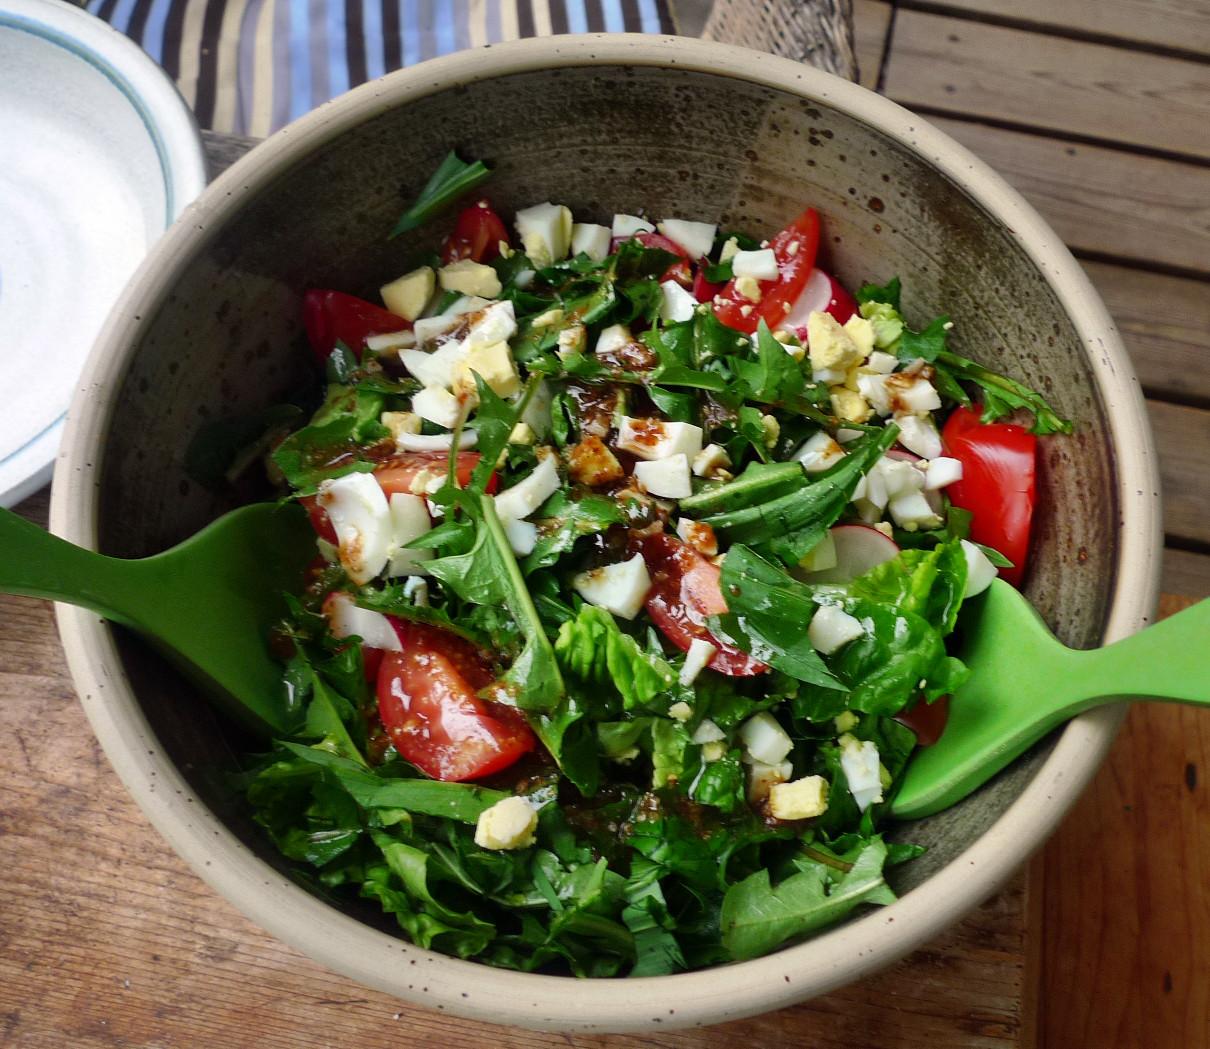 Lachs,Spargel,Salat,Kartoffeln - 25.4.15   (6)